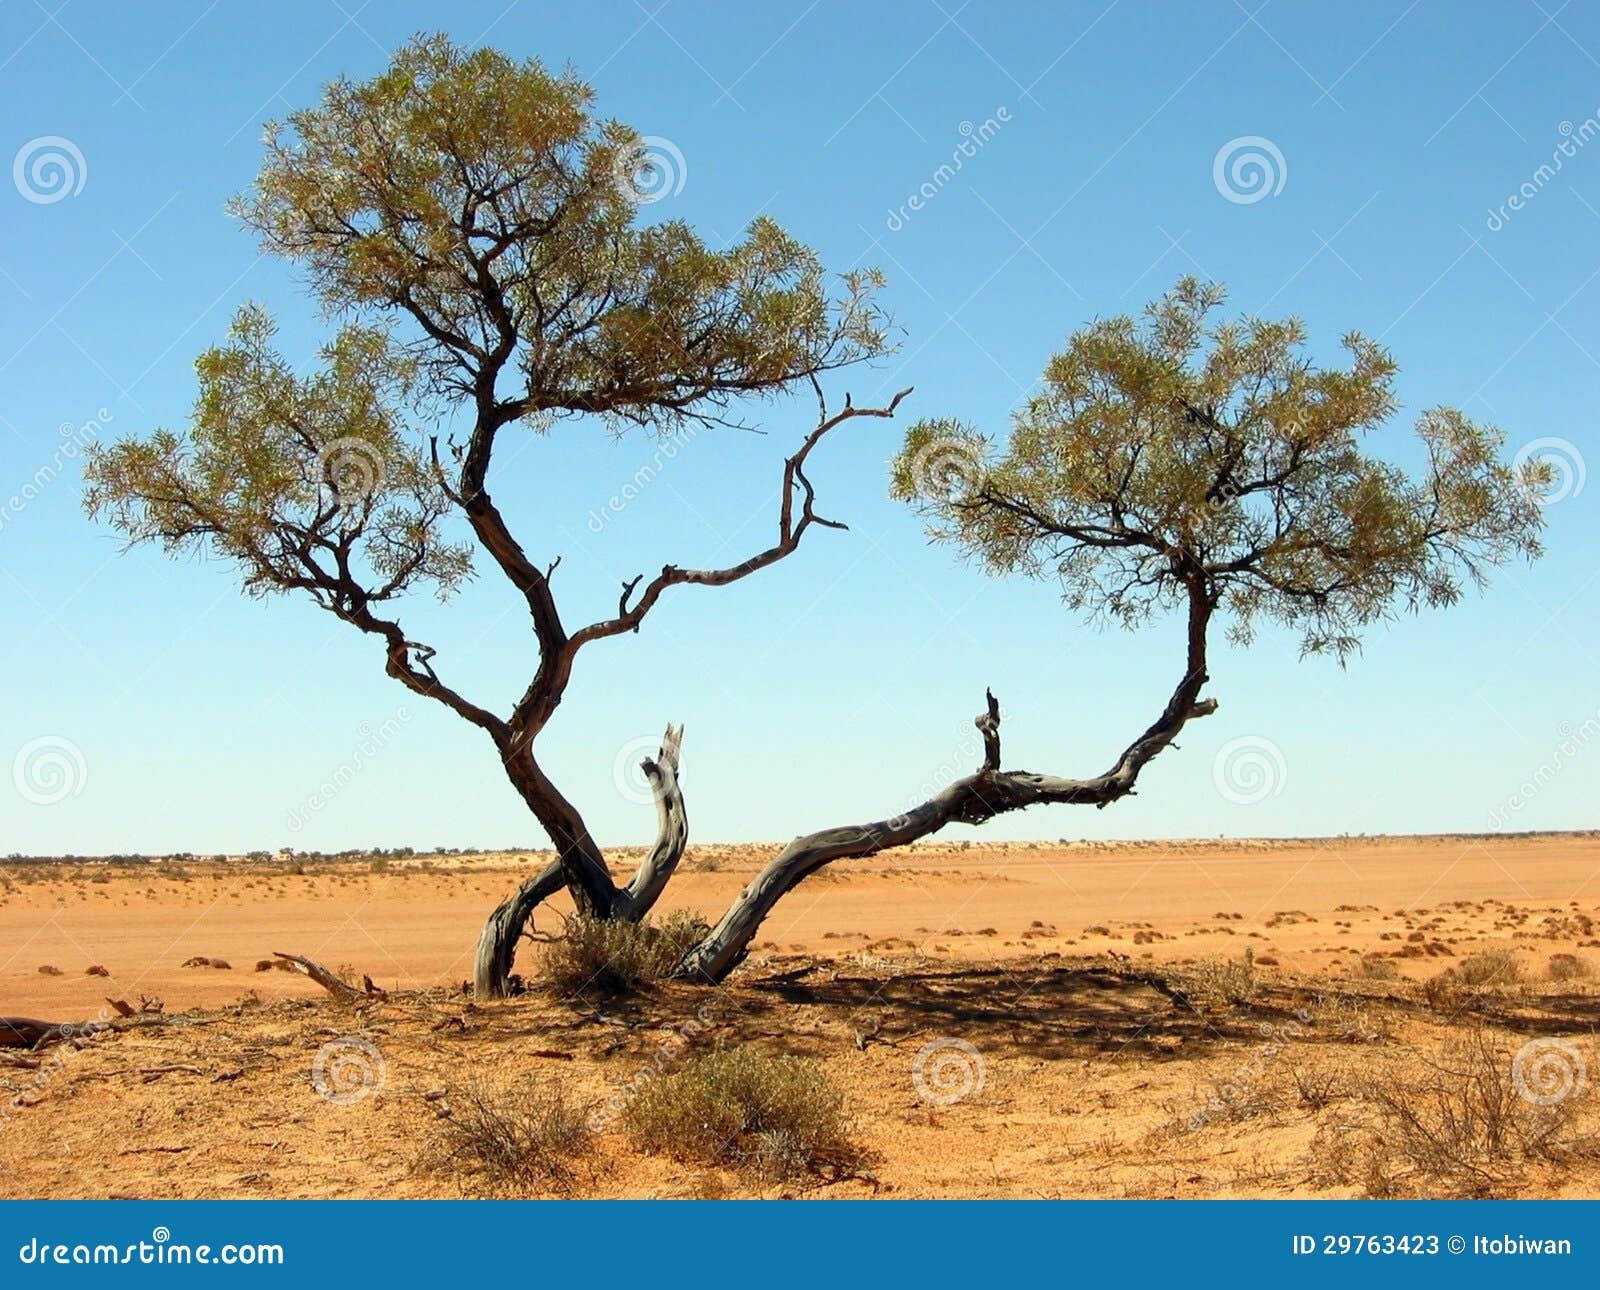 Australian Desert Animals